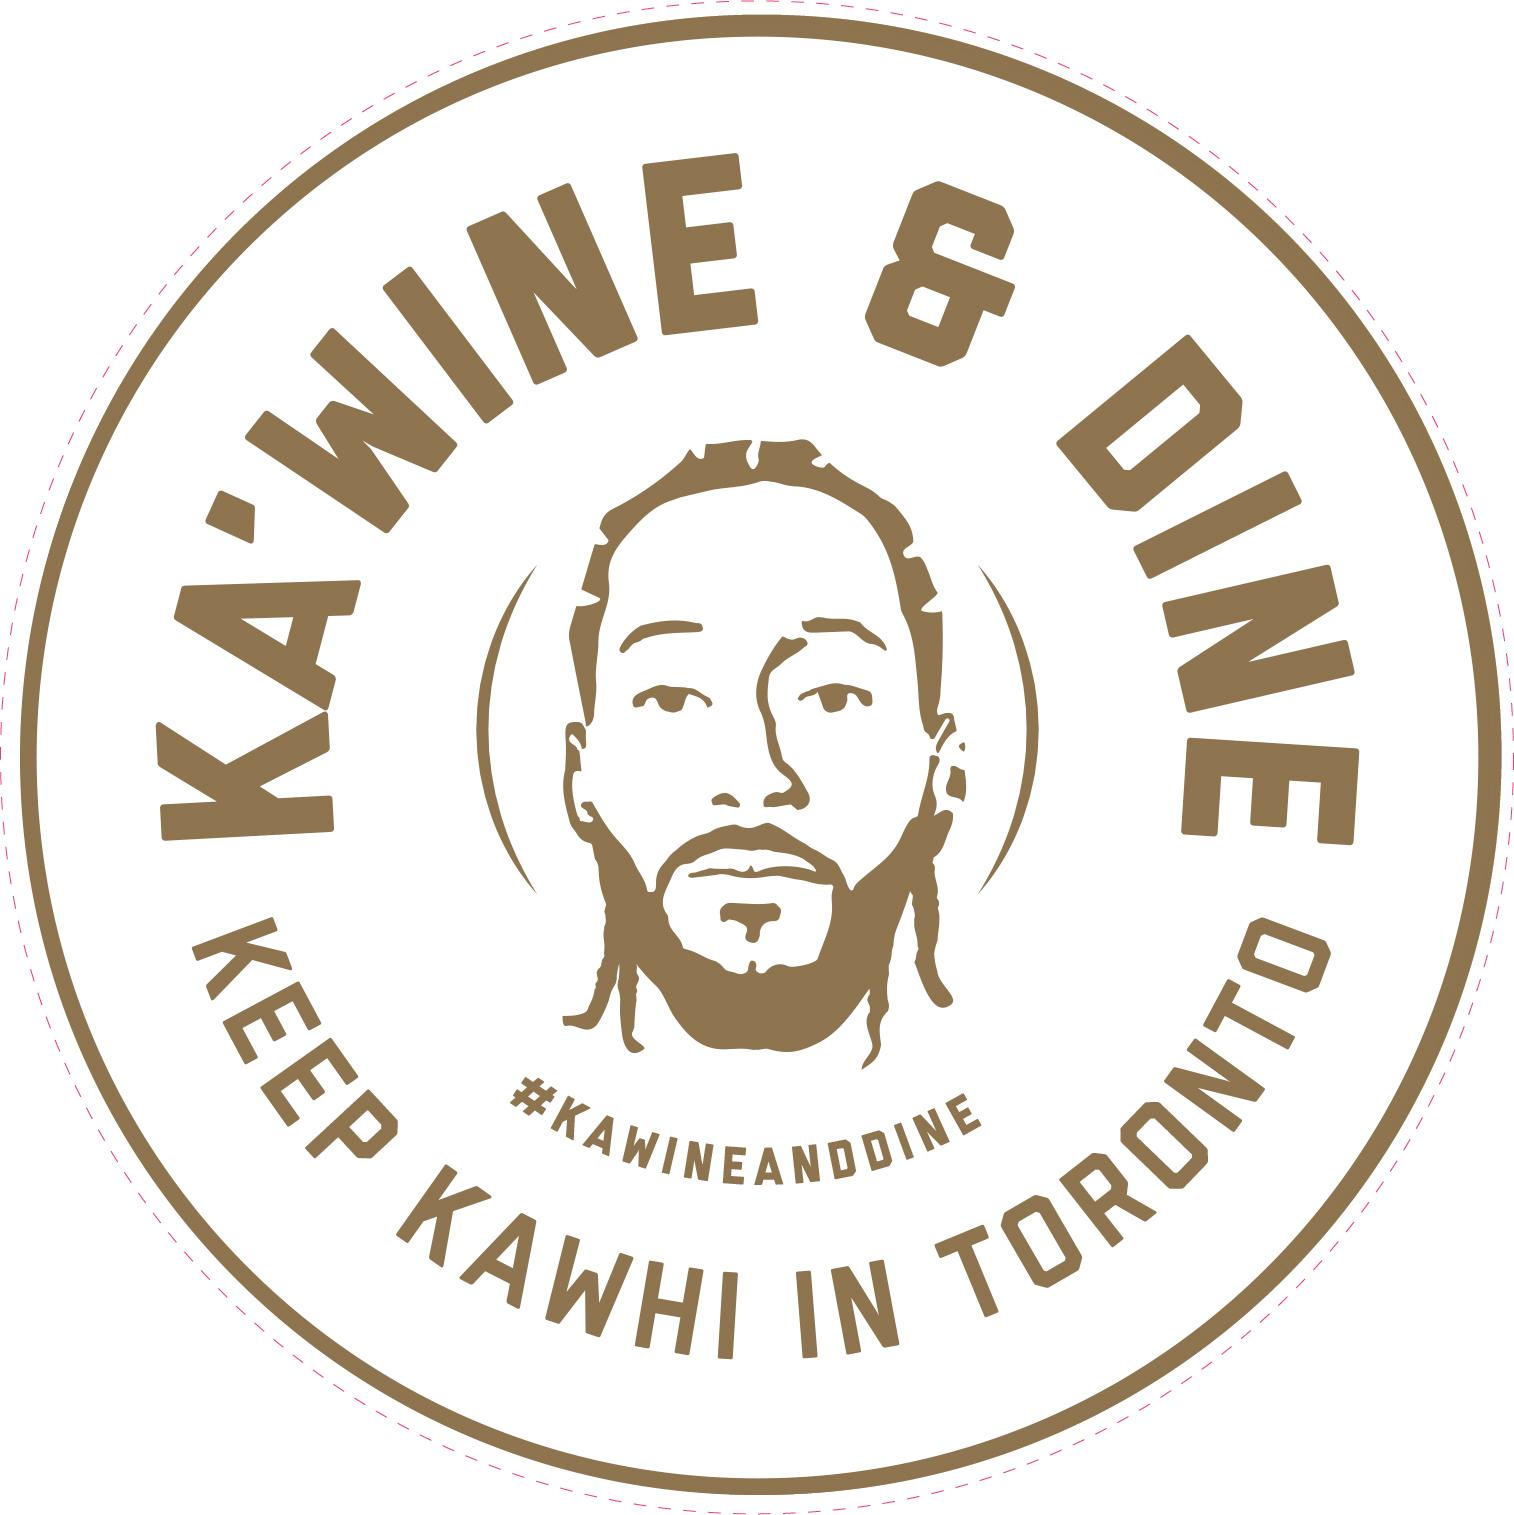 KaWineAndDine_Badge_stay.5db183c8 (1).jpg